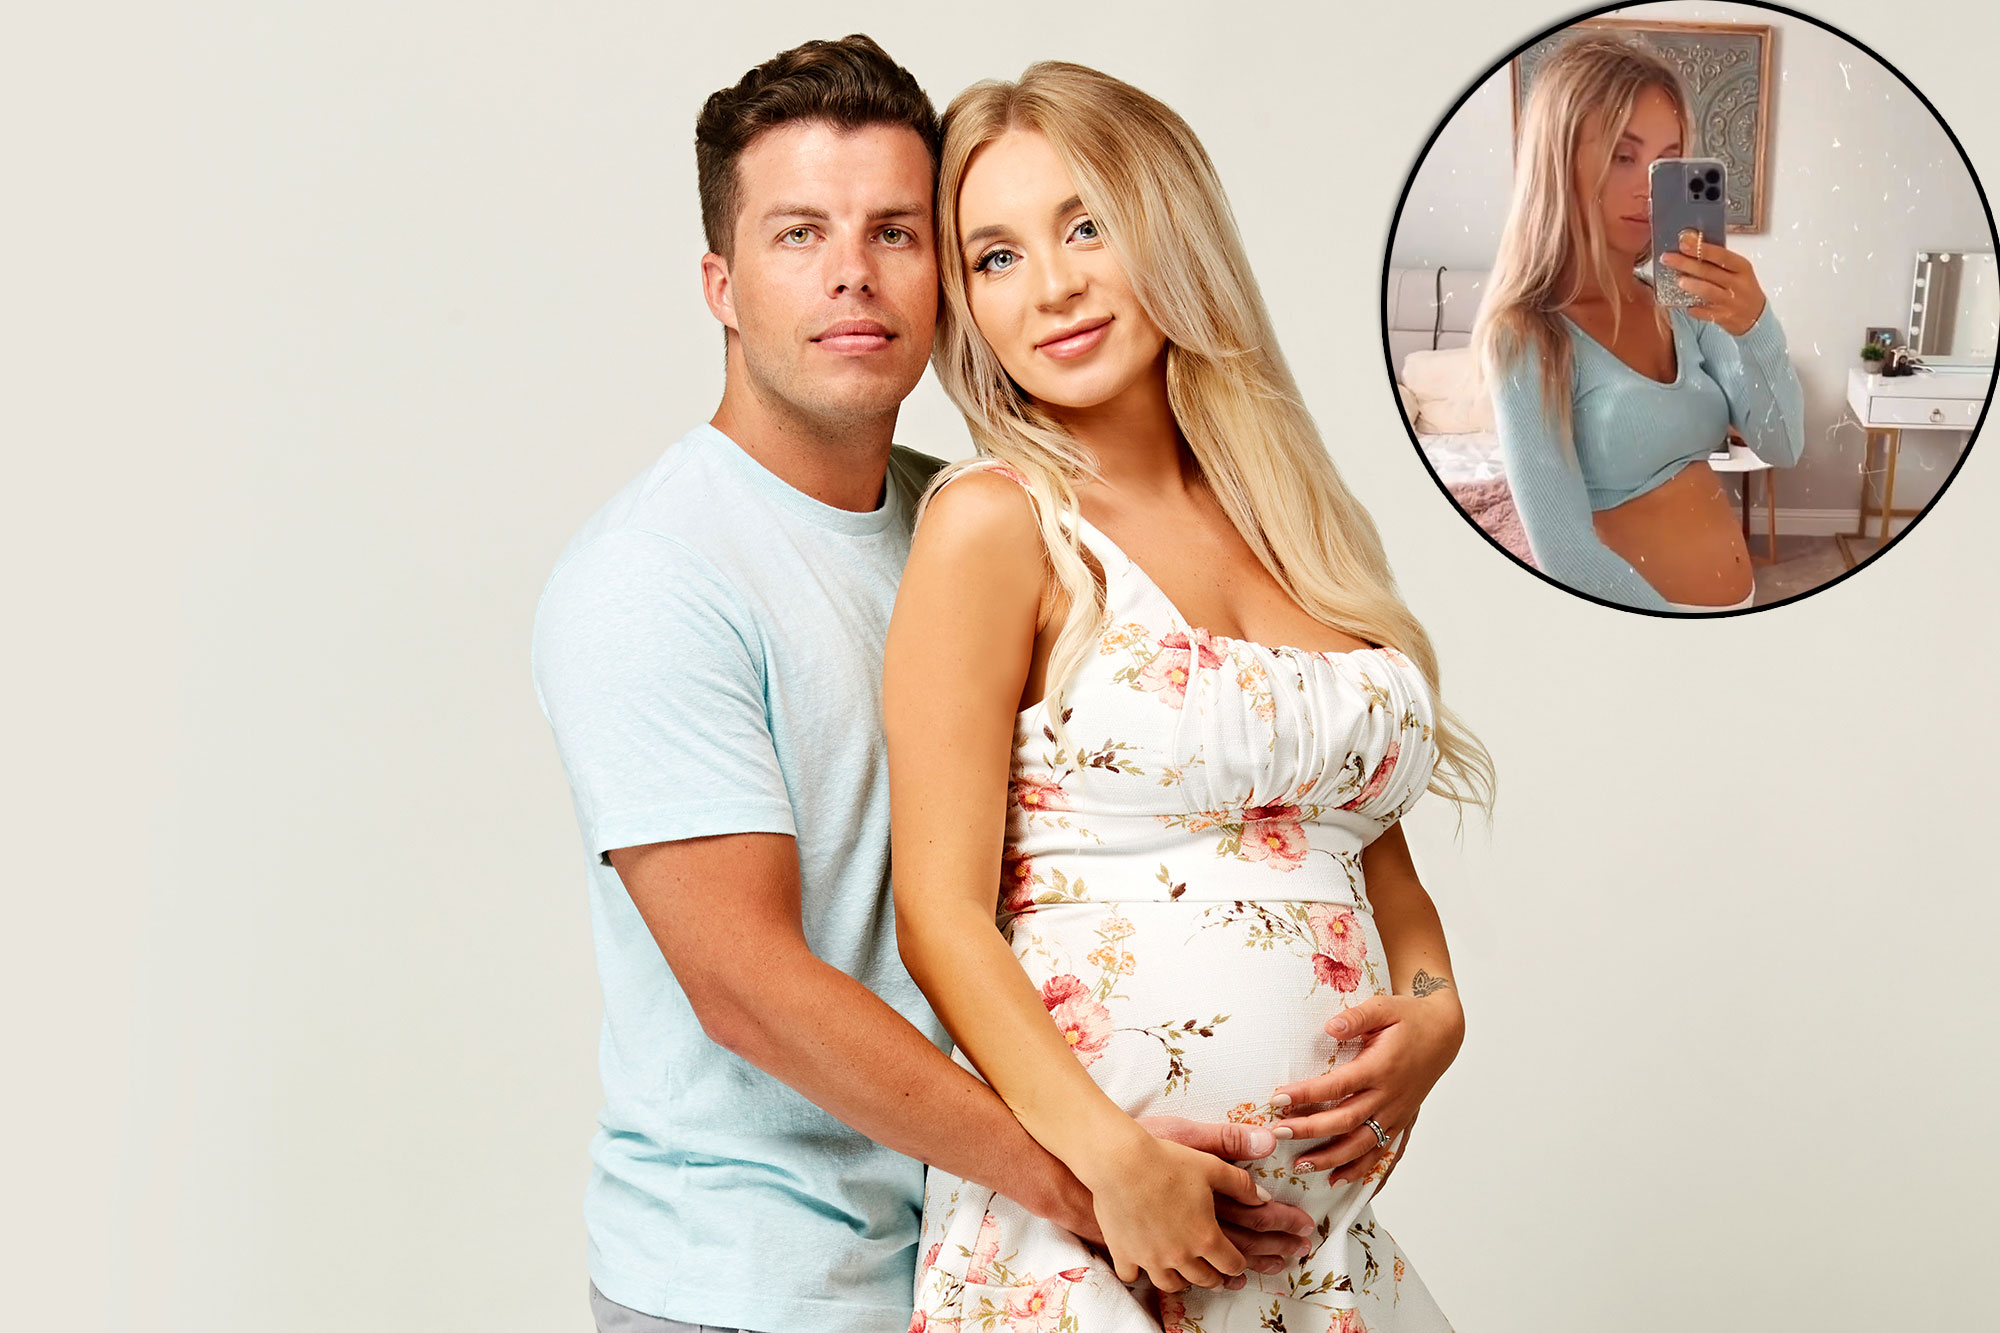 90 Day Fiance Star Yara Zaya Is Not Pregnant With Baby No 2 Amid Rumors Jovi Dufren